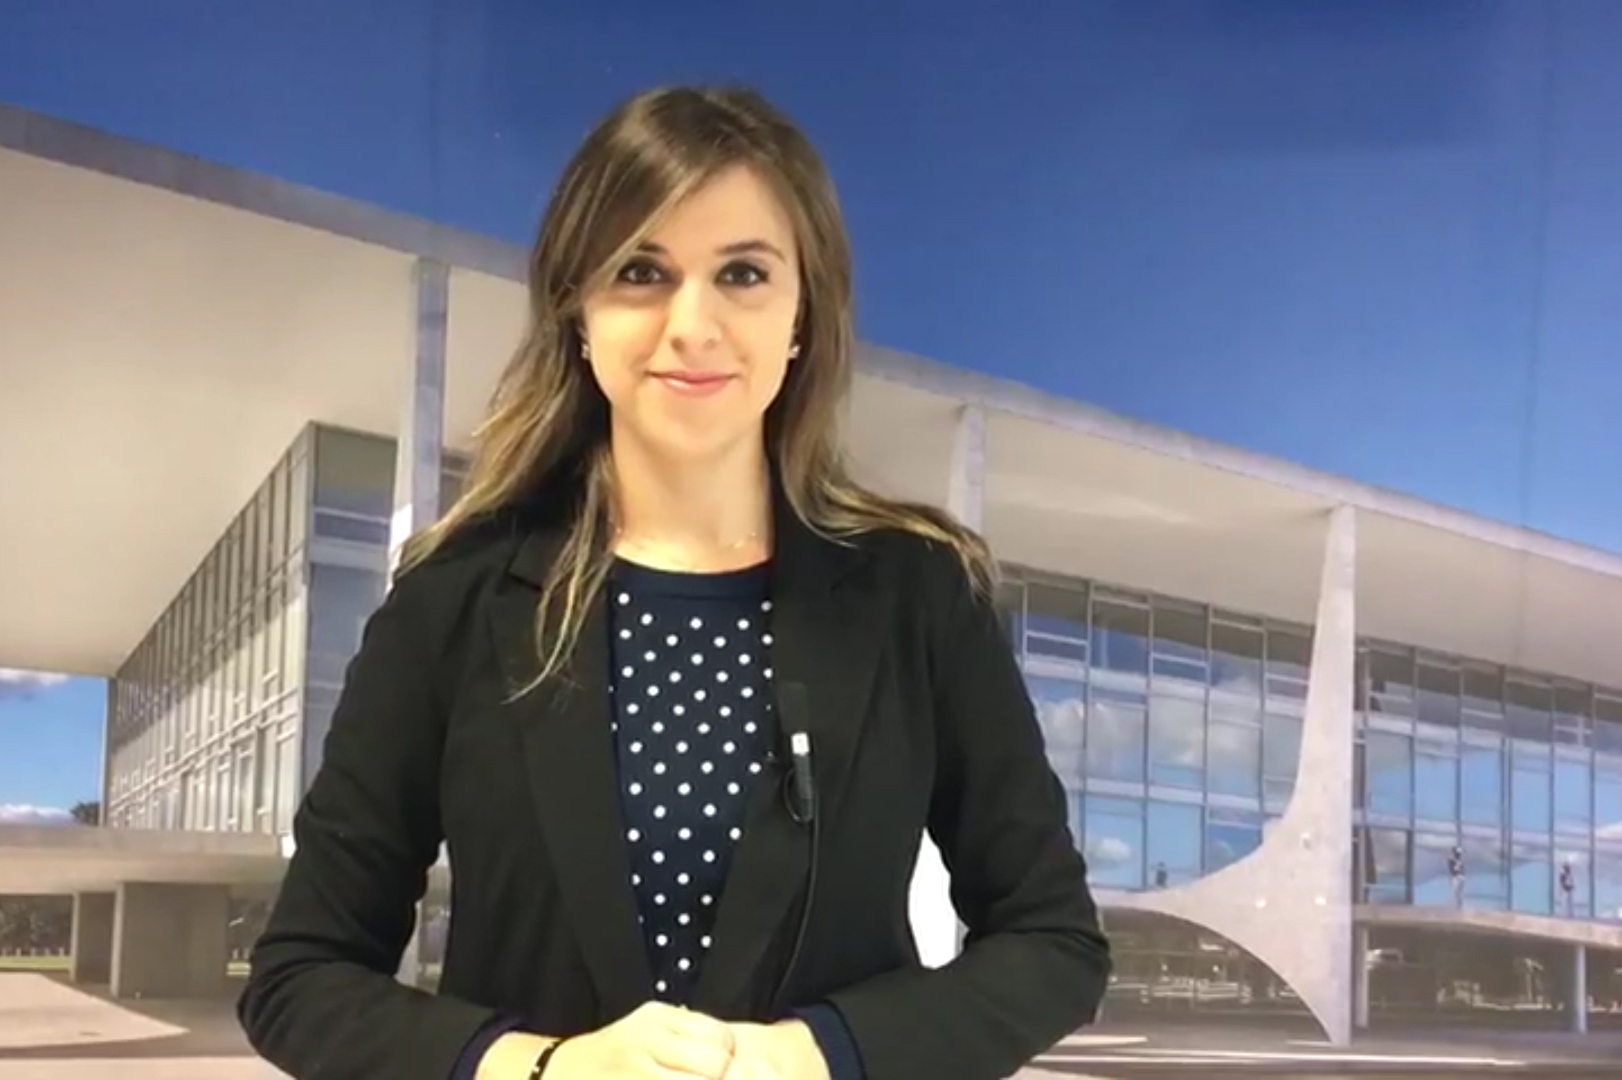 Kelly Matos: encontro de Temer, entrevista e ingenuidade, o resumo da crise no final de semana